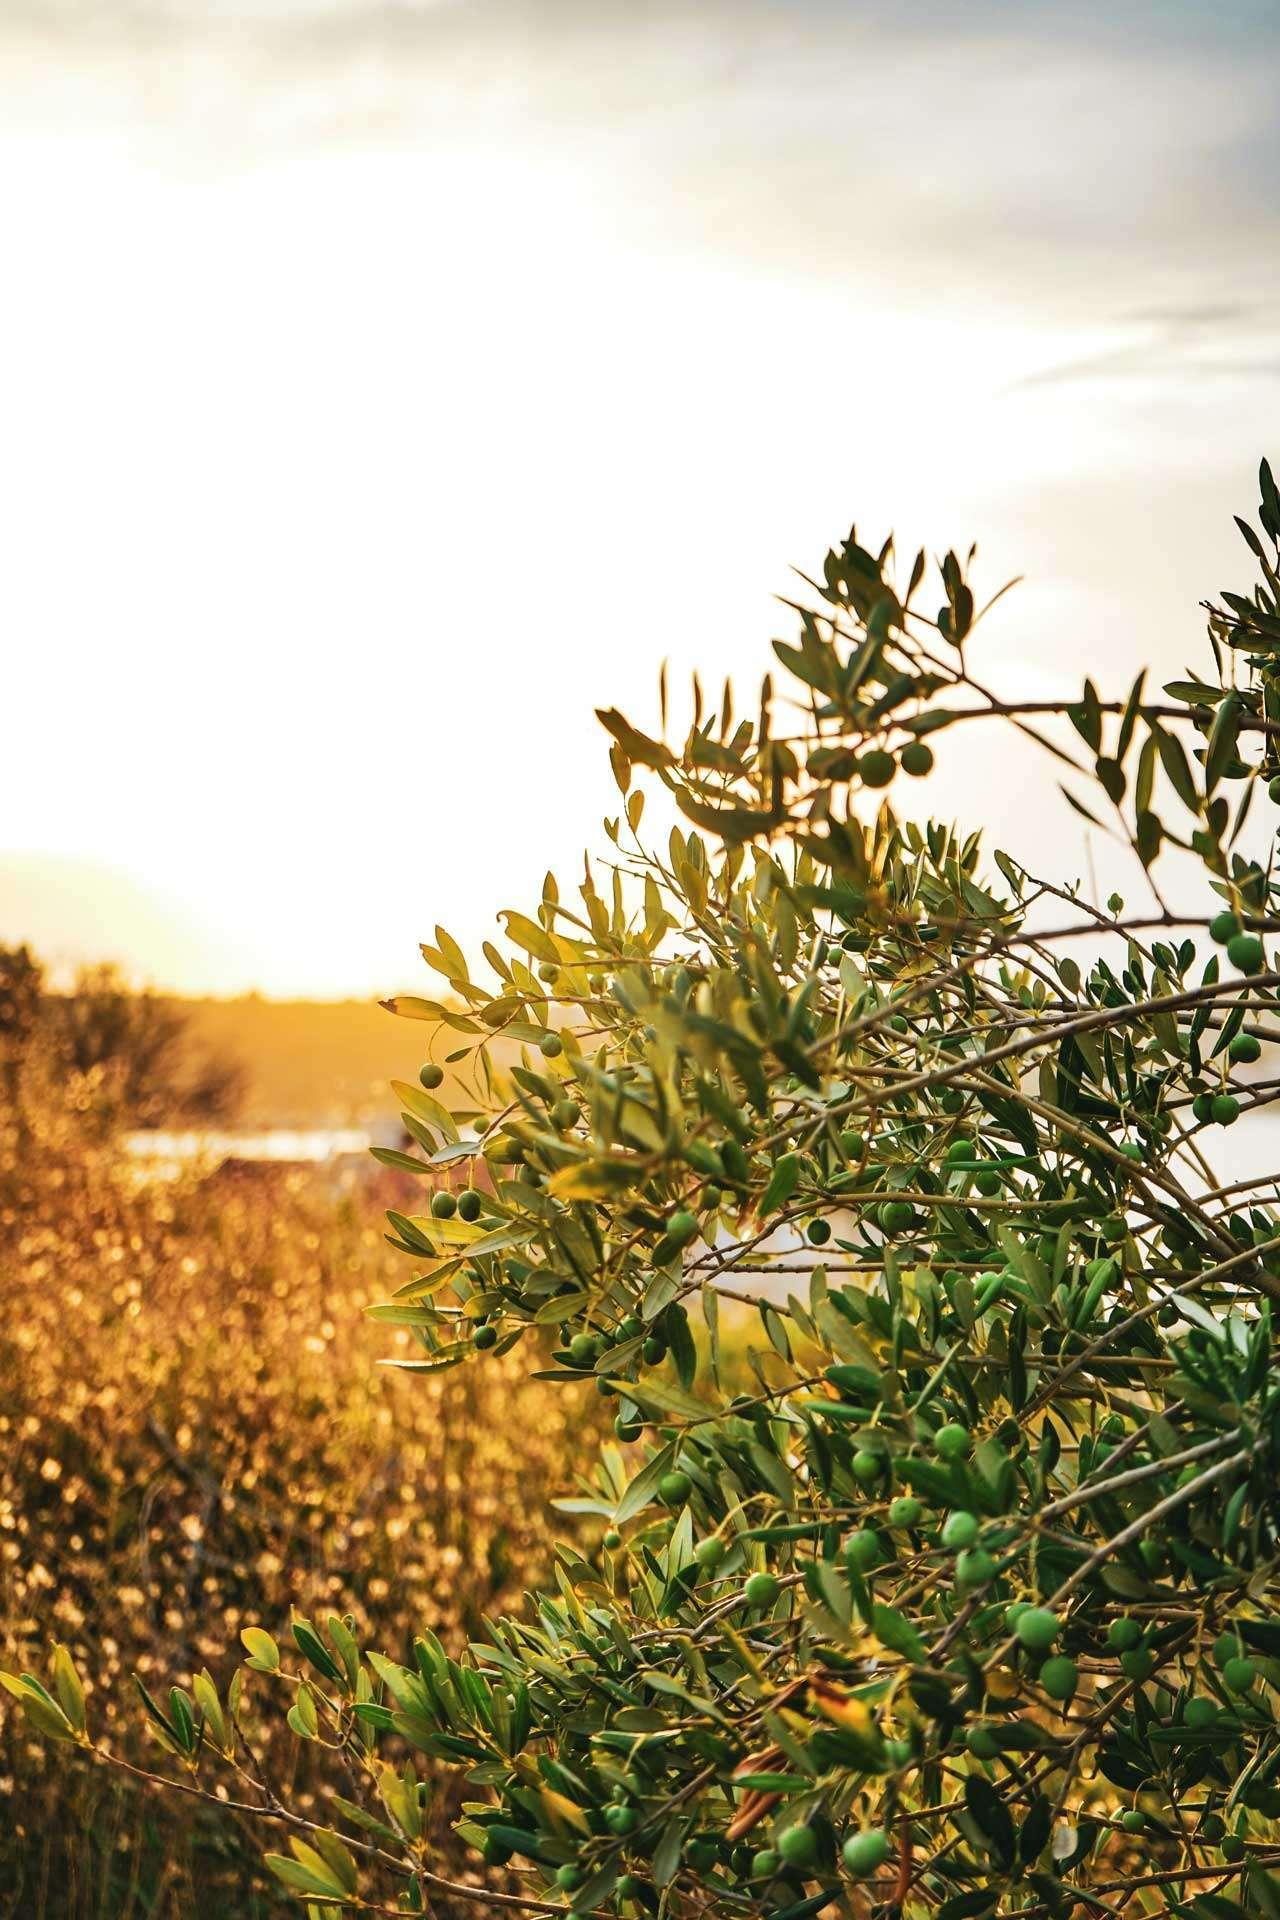 Olivenlund fra Italia der verdens beste olivenolje til pizza